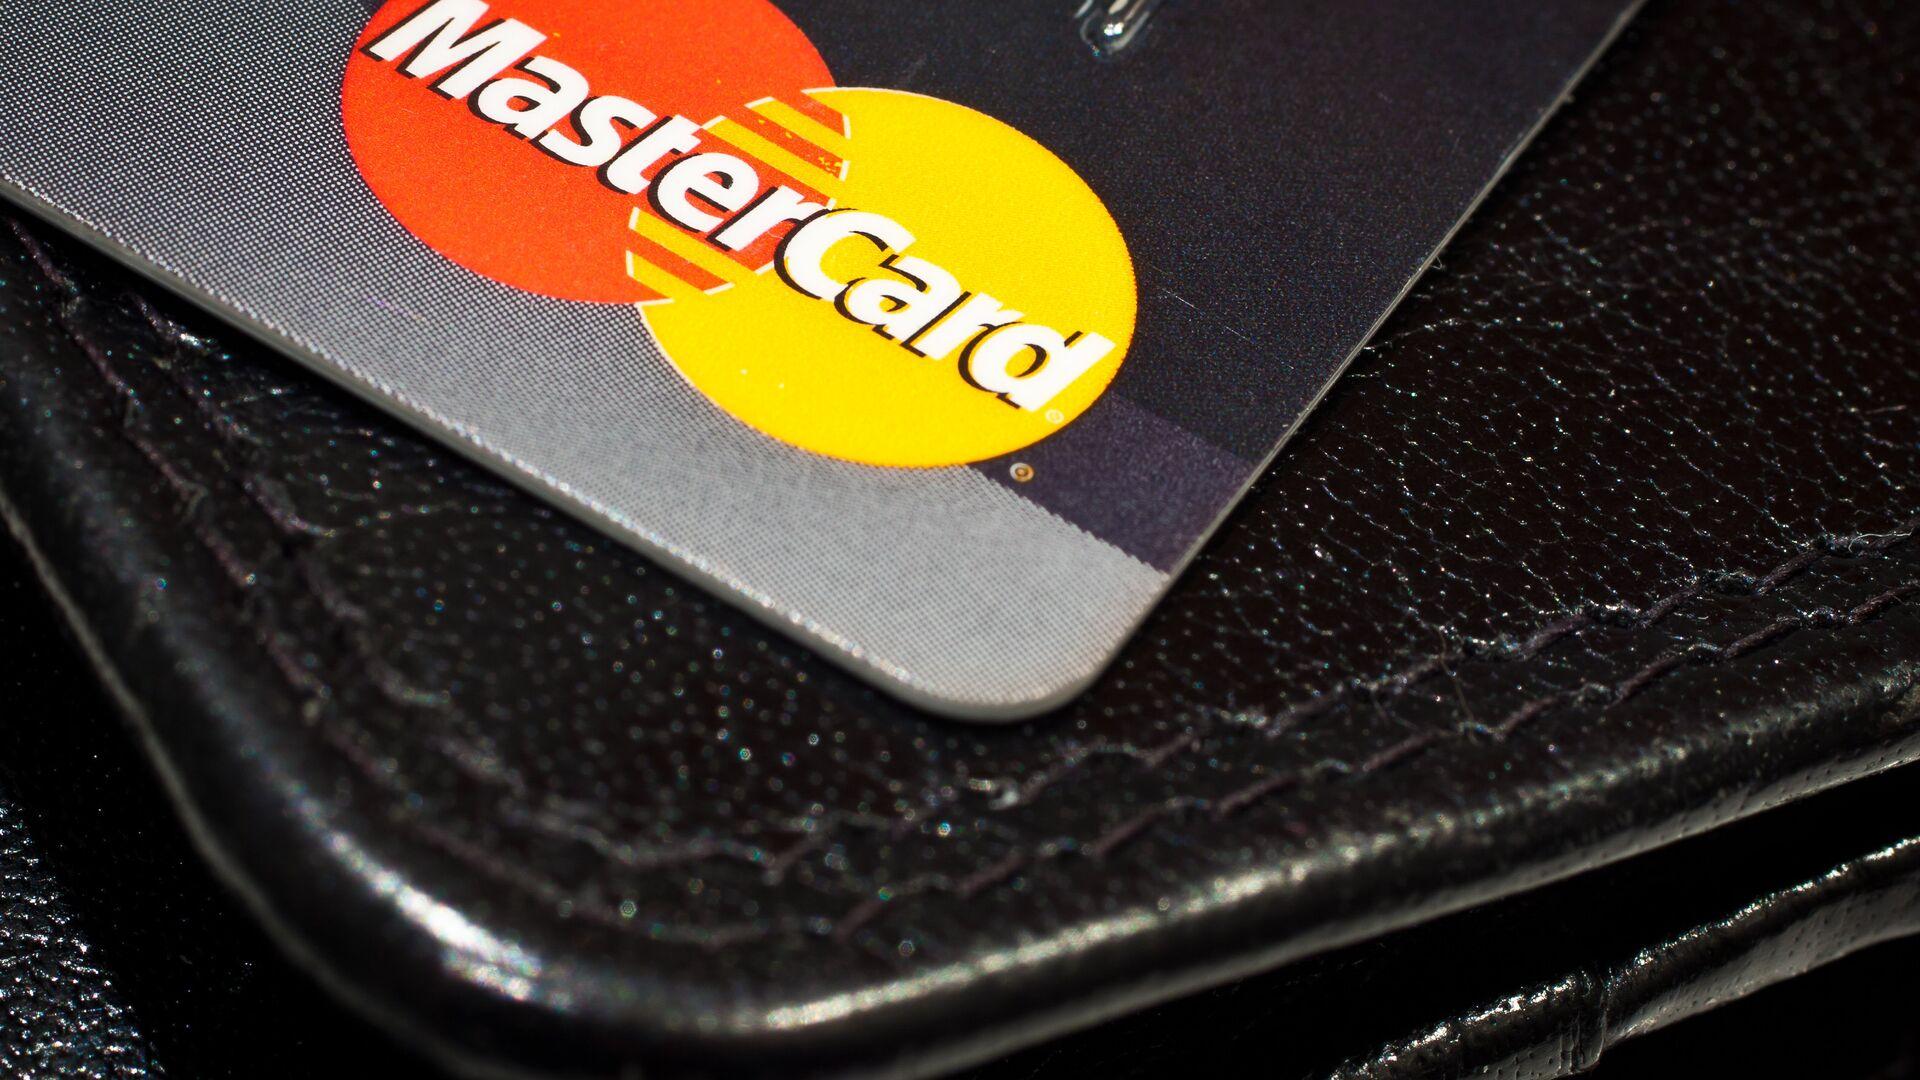 Una tarjeta de MasterCard - Sputnik Mundo, 1920, 11.06.2021